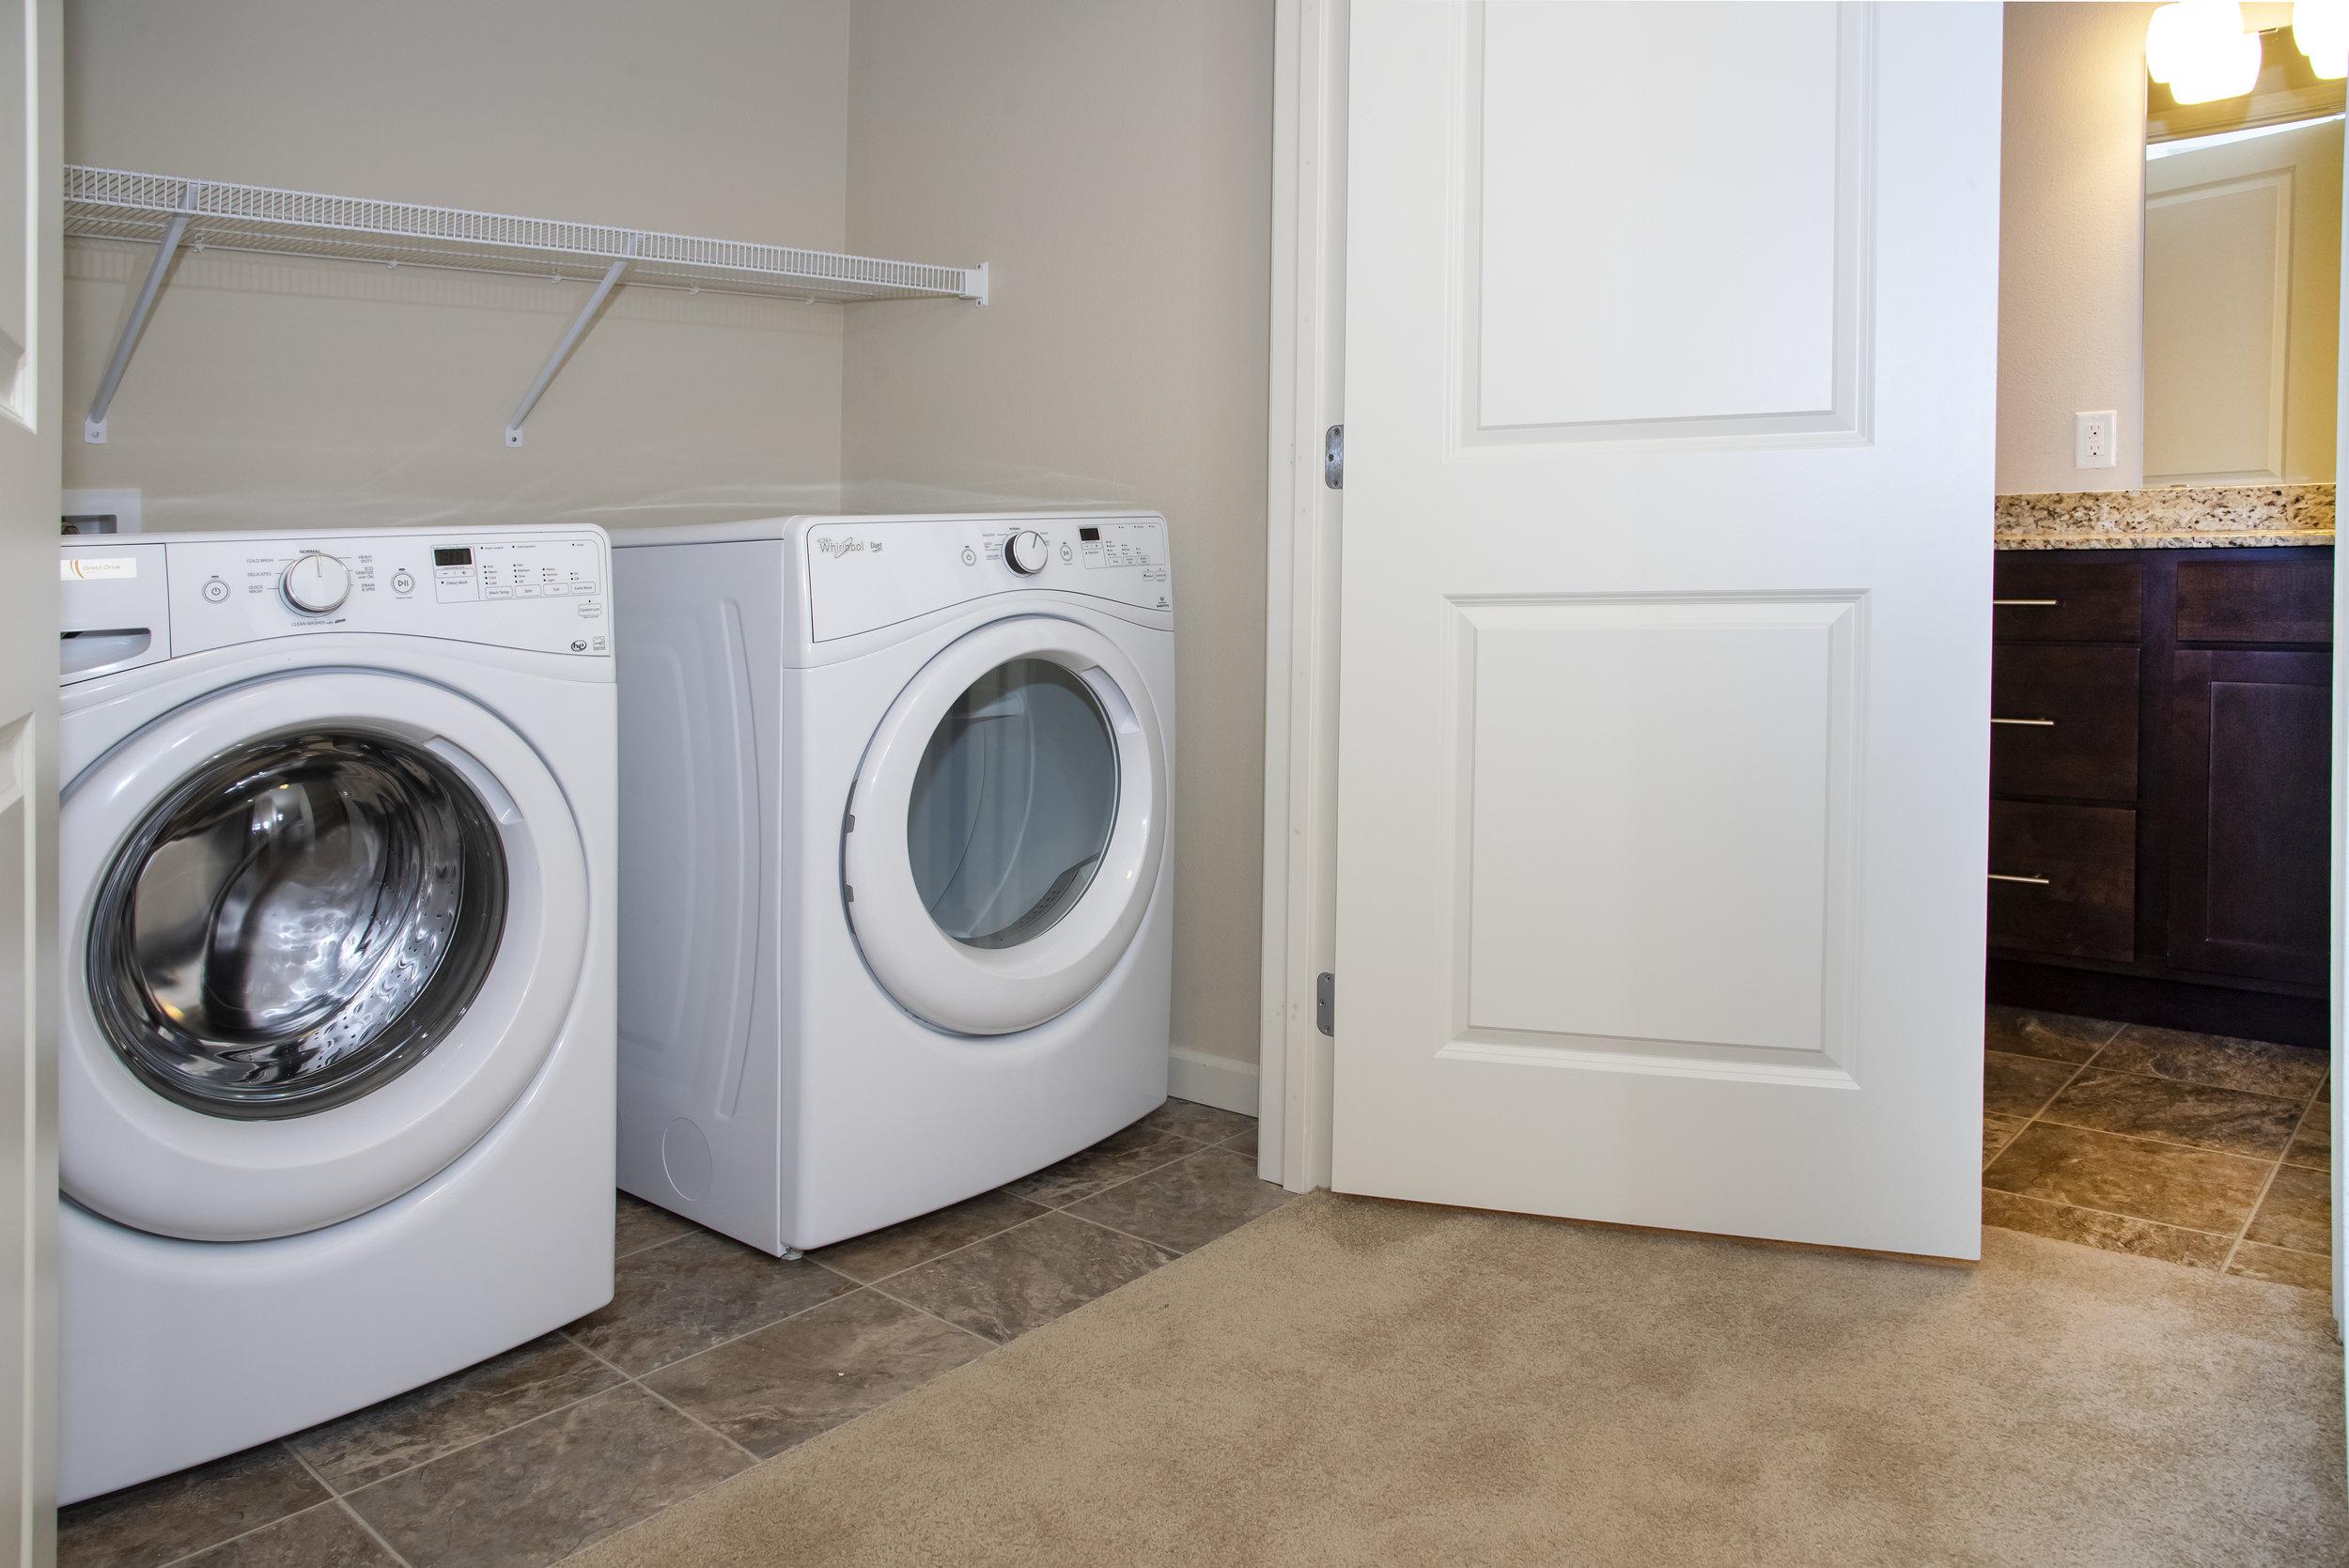 06 In-Home Washer _ Dryer.jpg